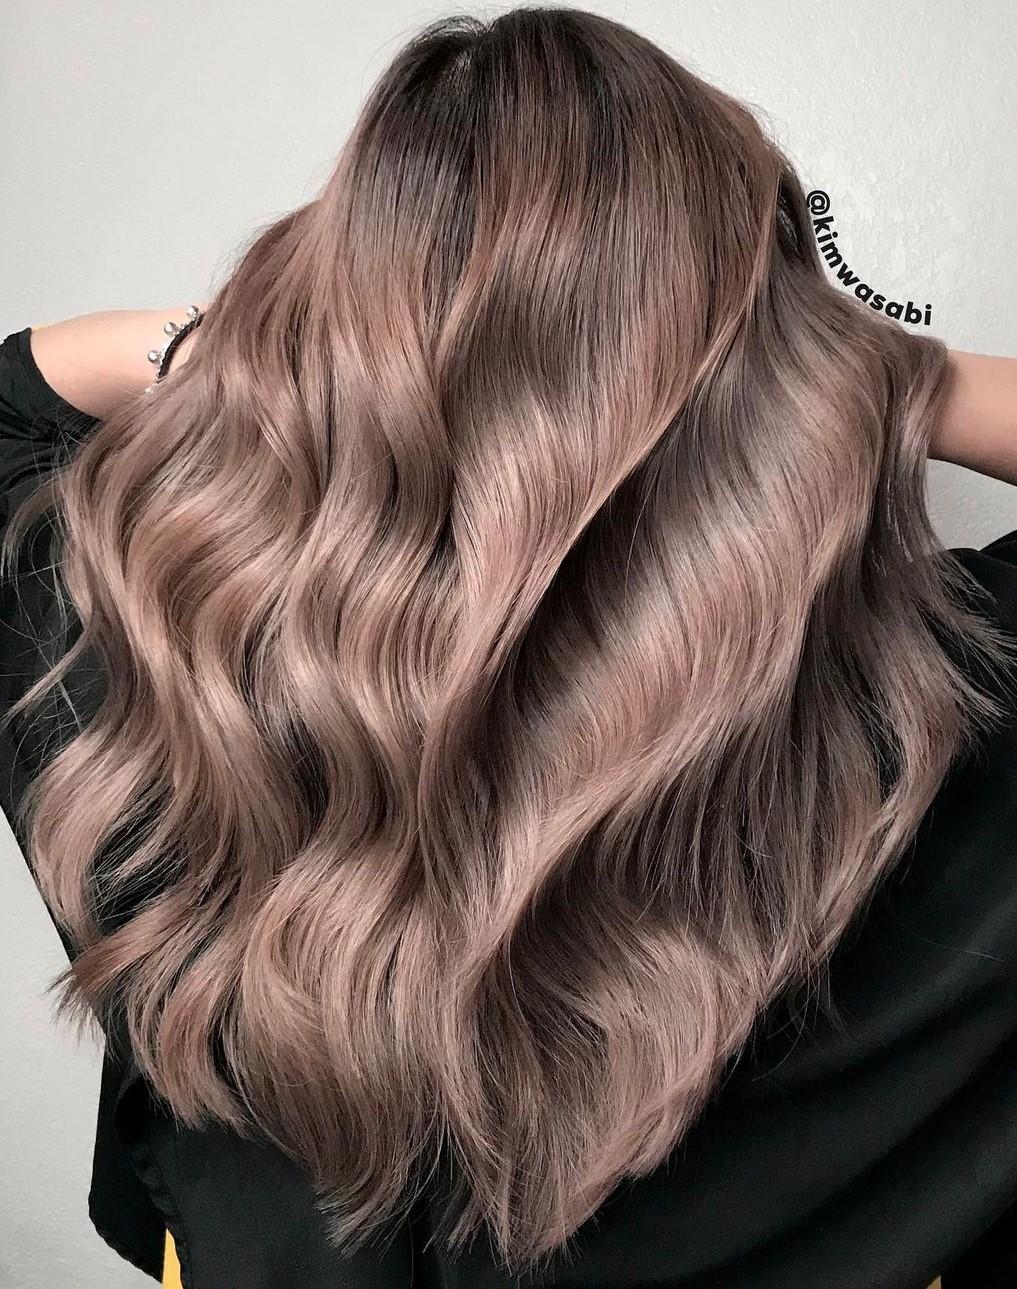 Long Mushroom Brown Hair with Beach Curls